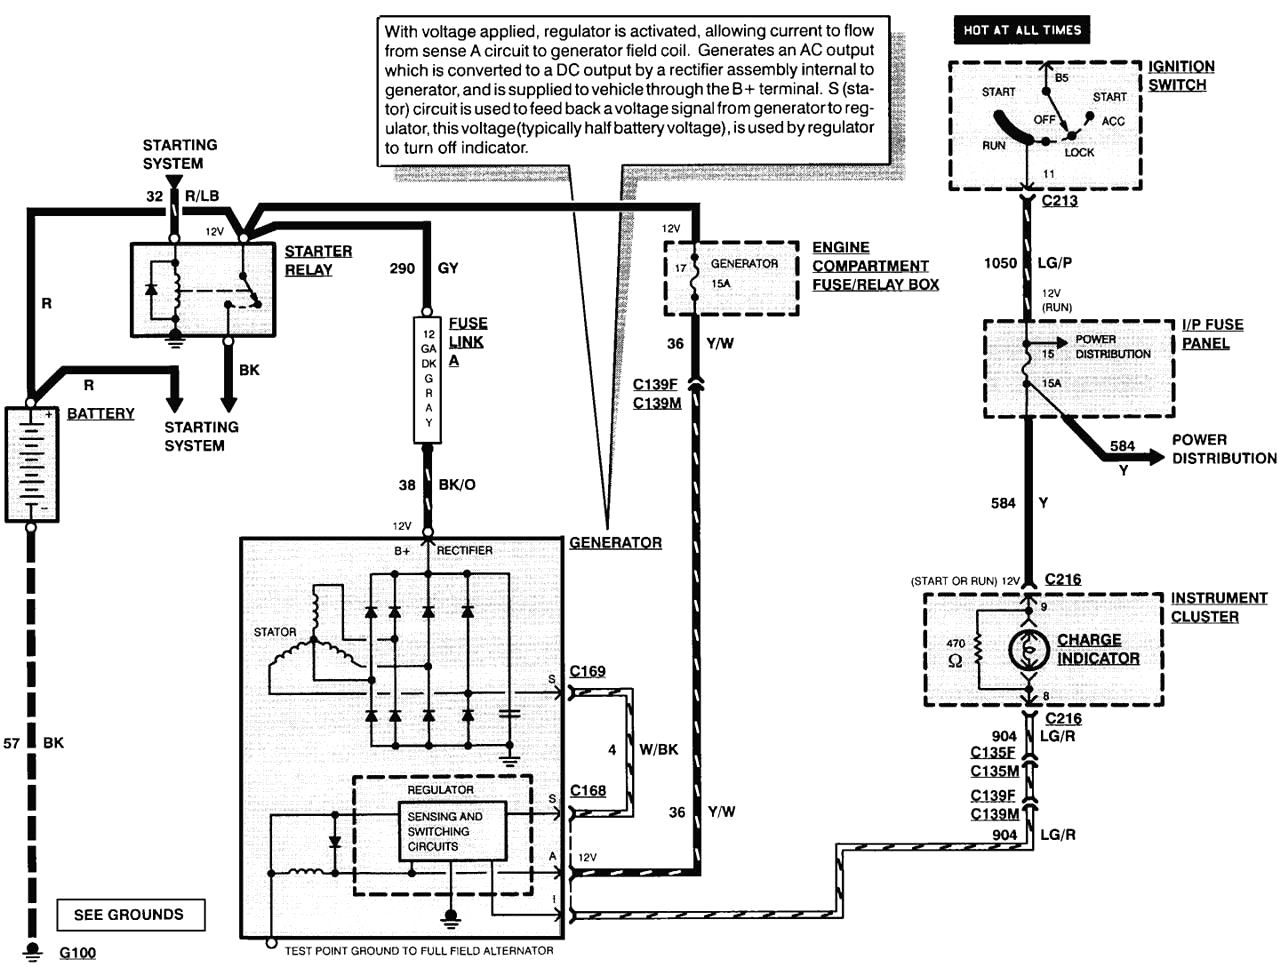 Ford 555d Wiring Diagram Library John Deere Backhoe Also 9n Tractor 555c Alternator Basic Guide U2022 Part 555